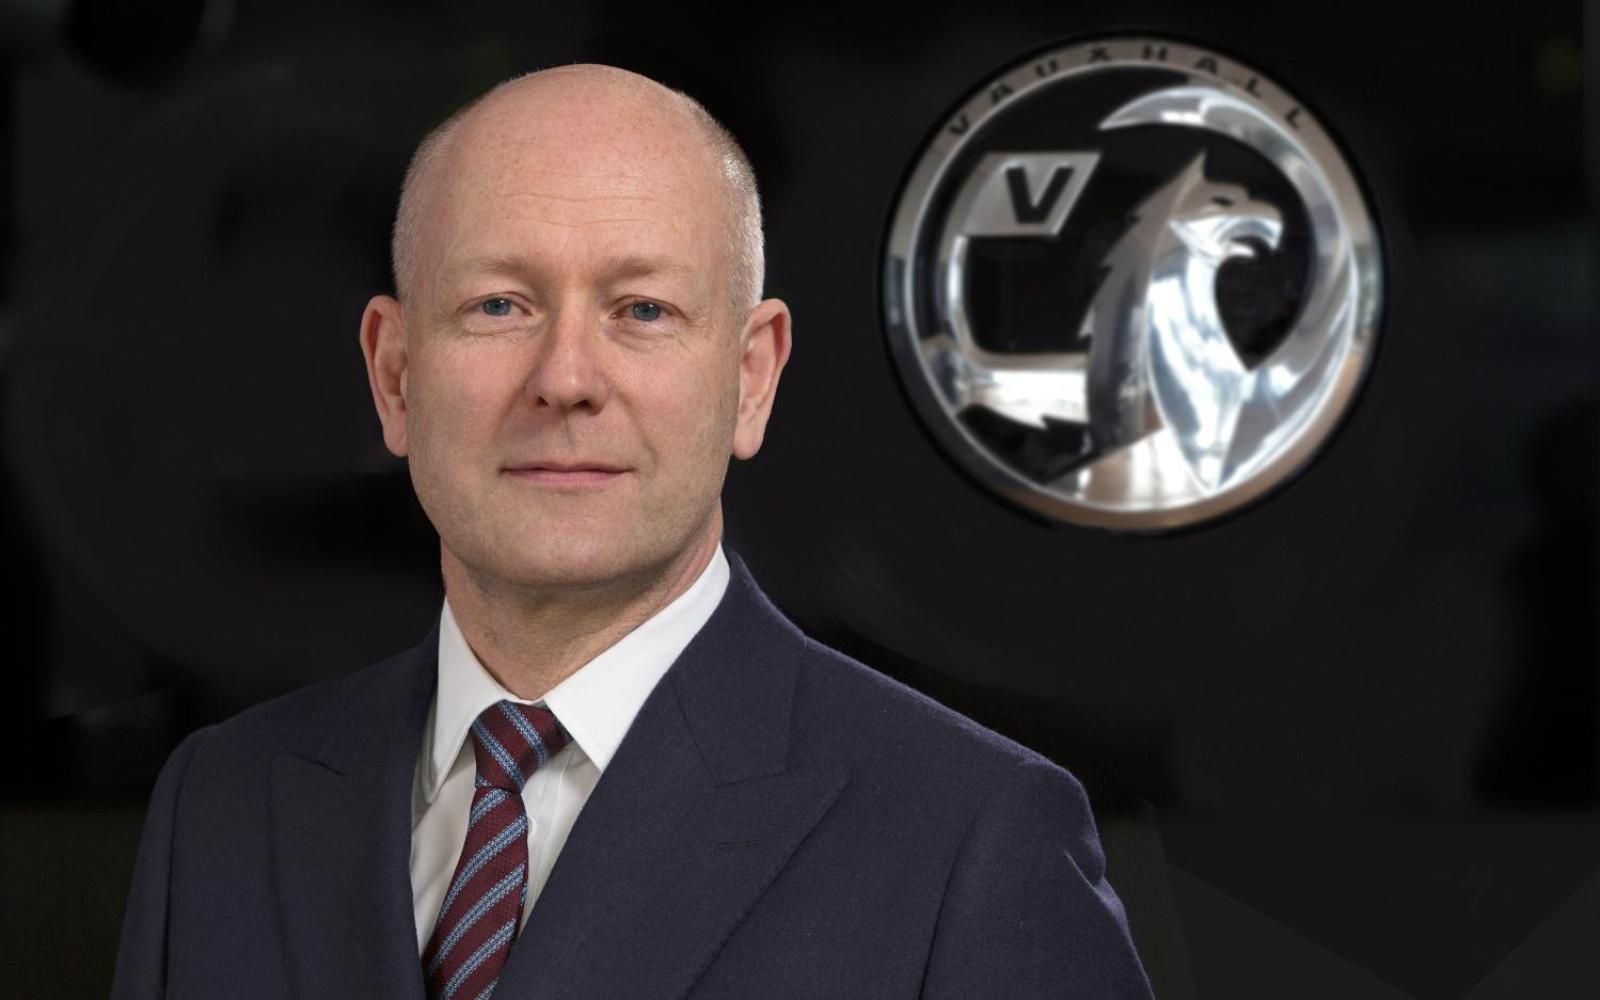 Tim Tozer Chairman Vauxhall 2014 Headshot FrontSeatDriver.co.uk